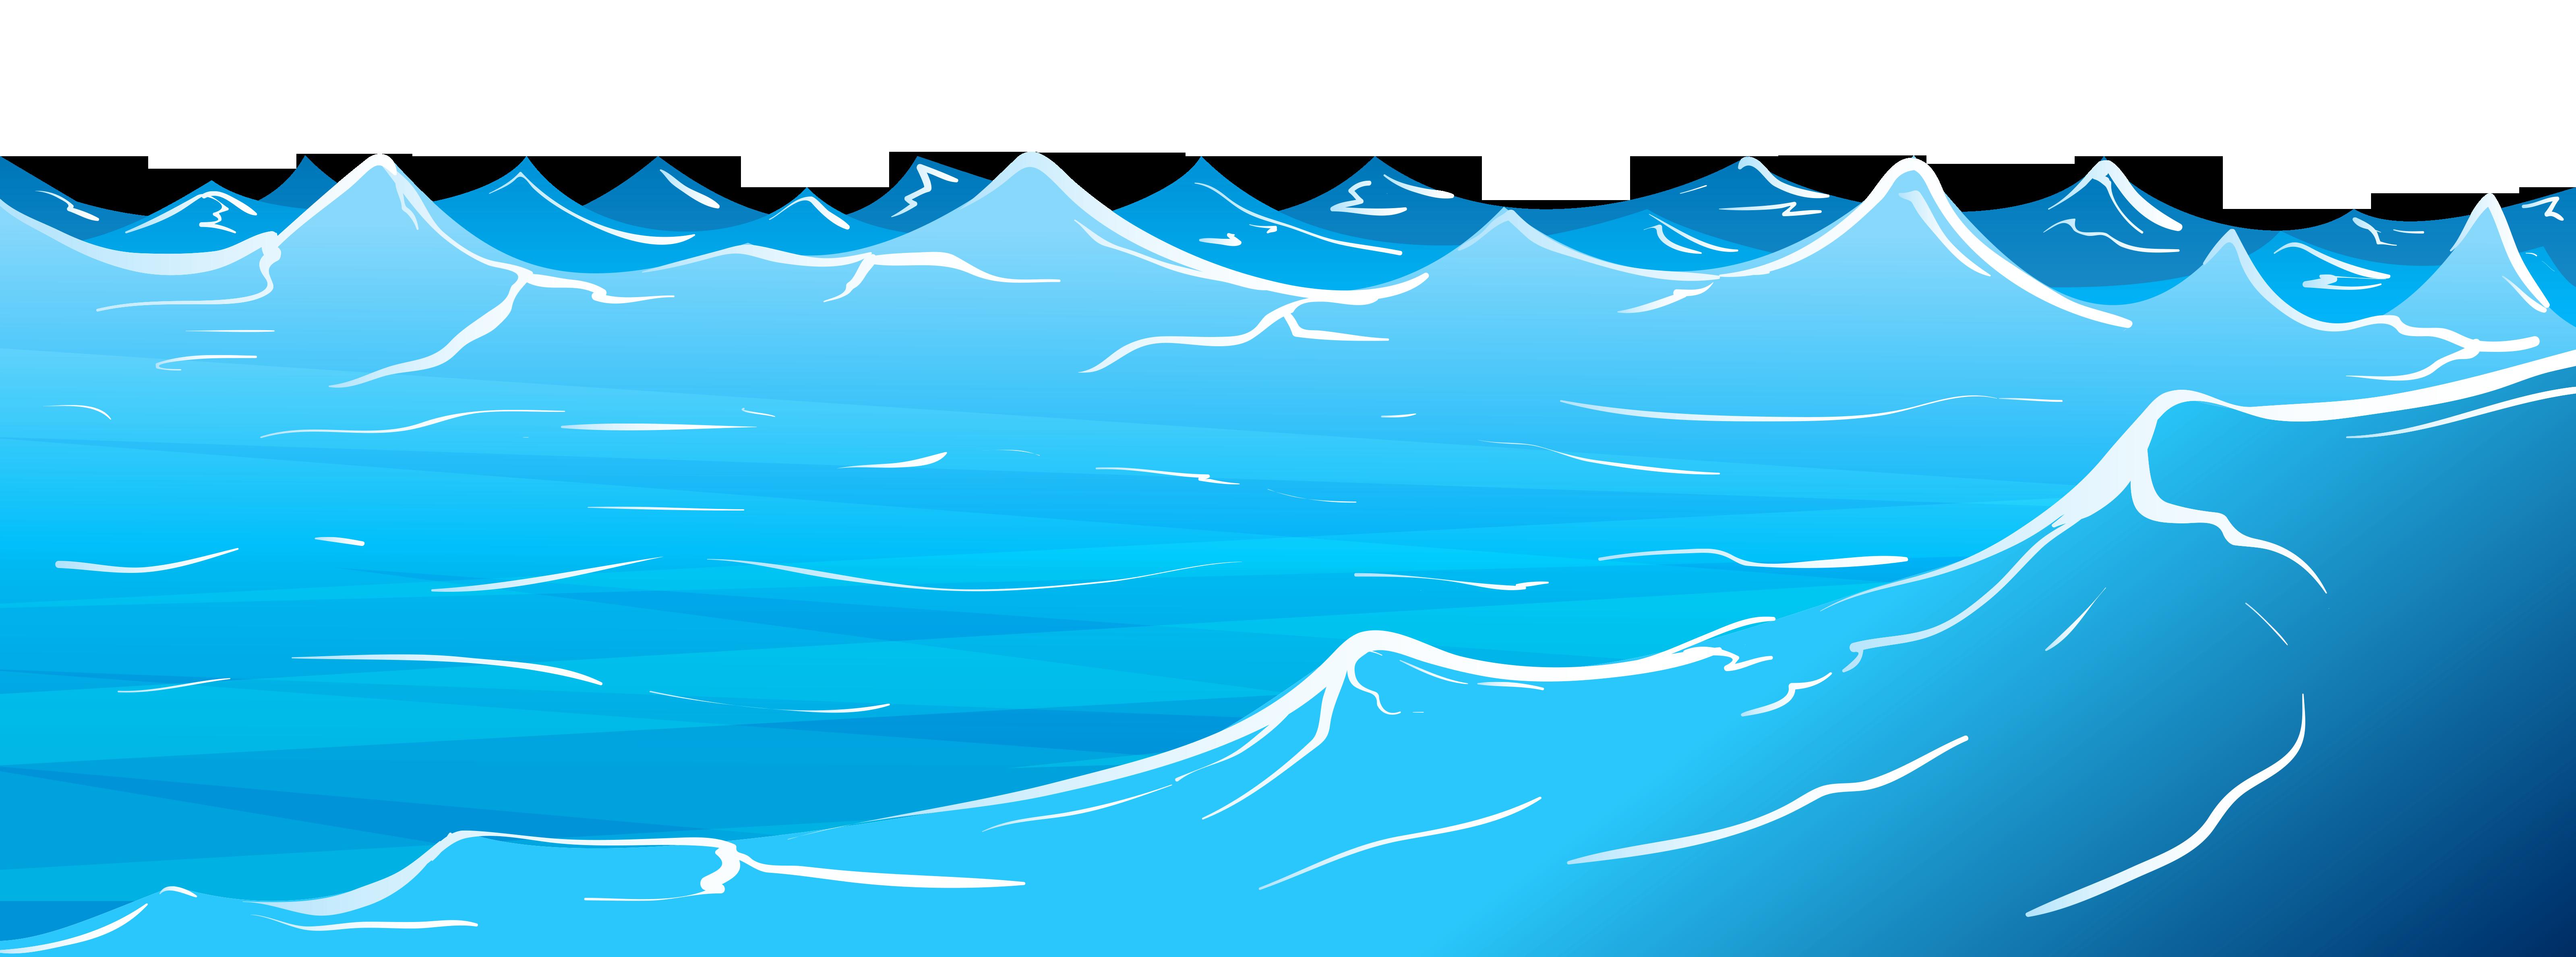 Waves ocean water clipart